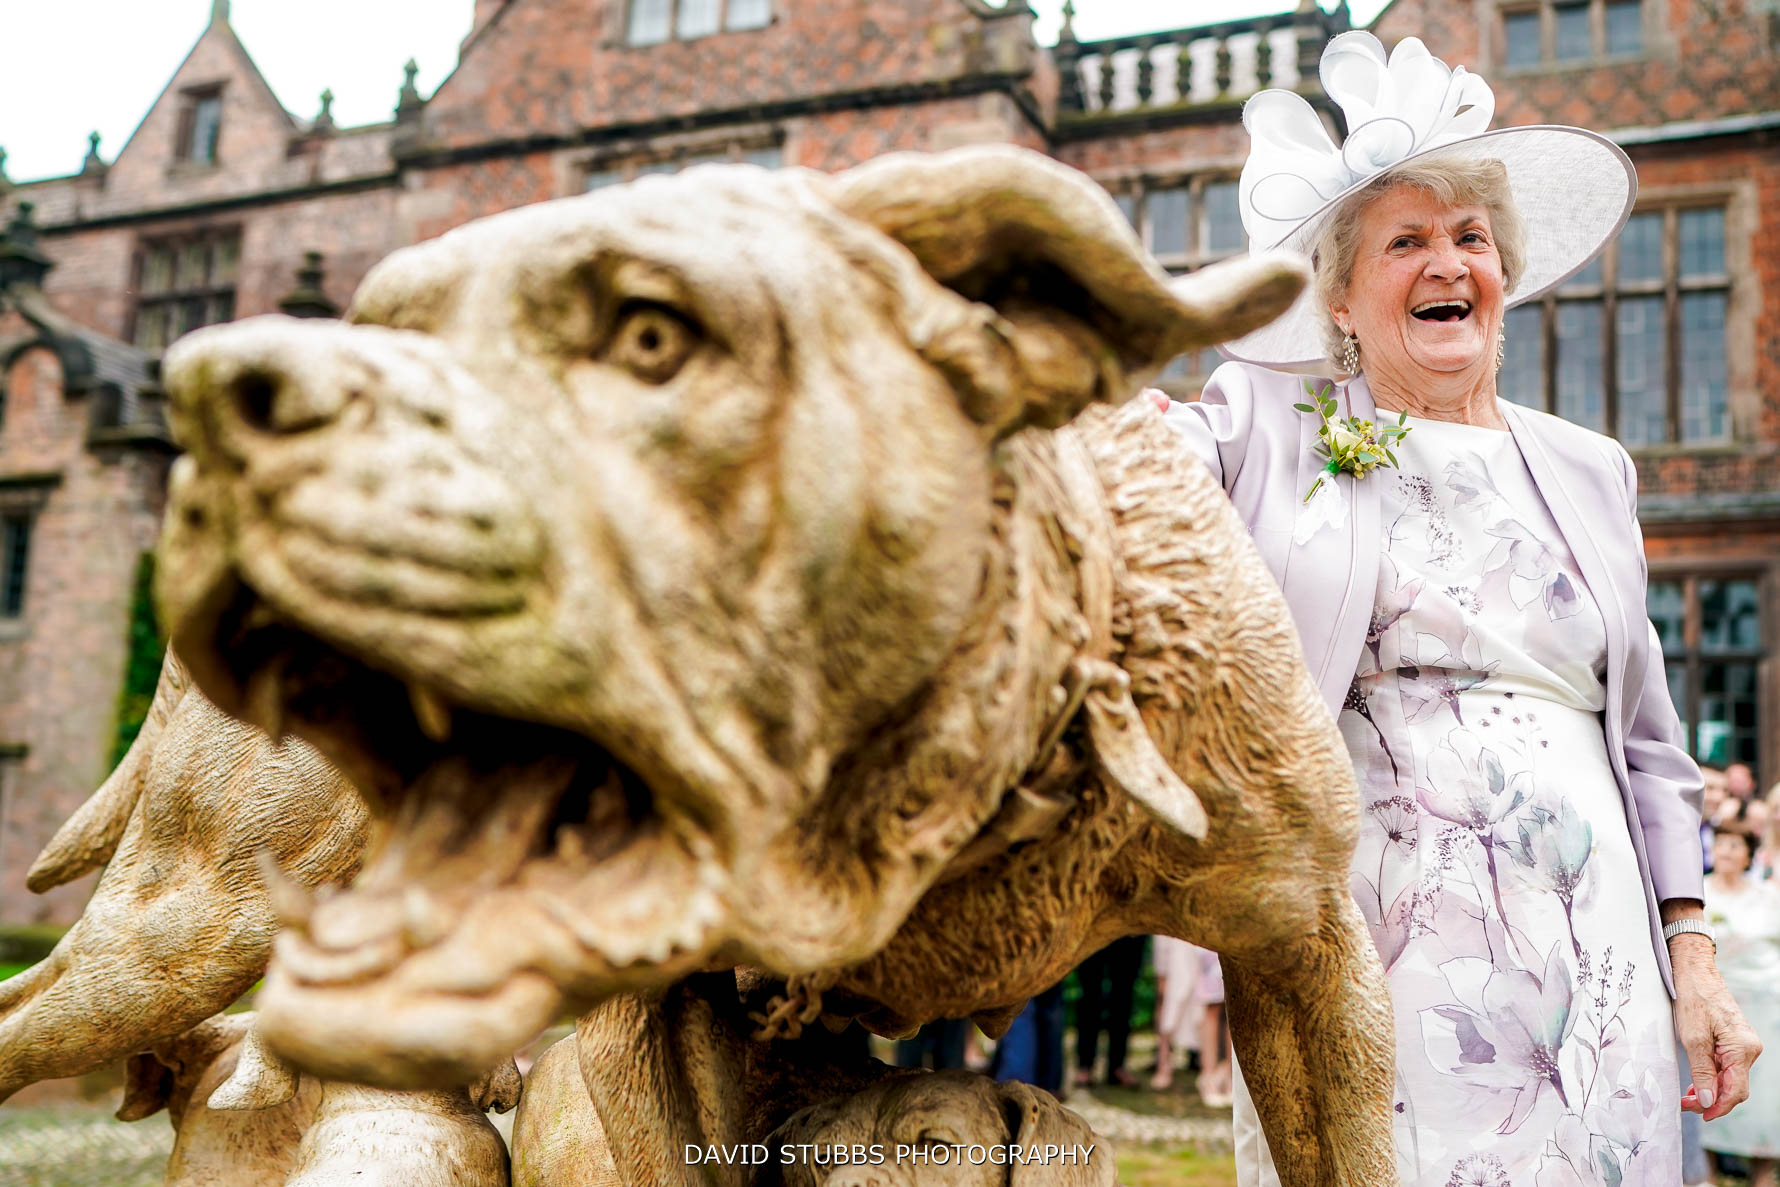 nan with dog statue at dorfold hall